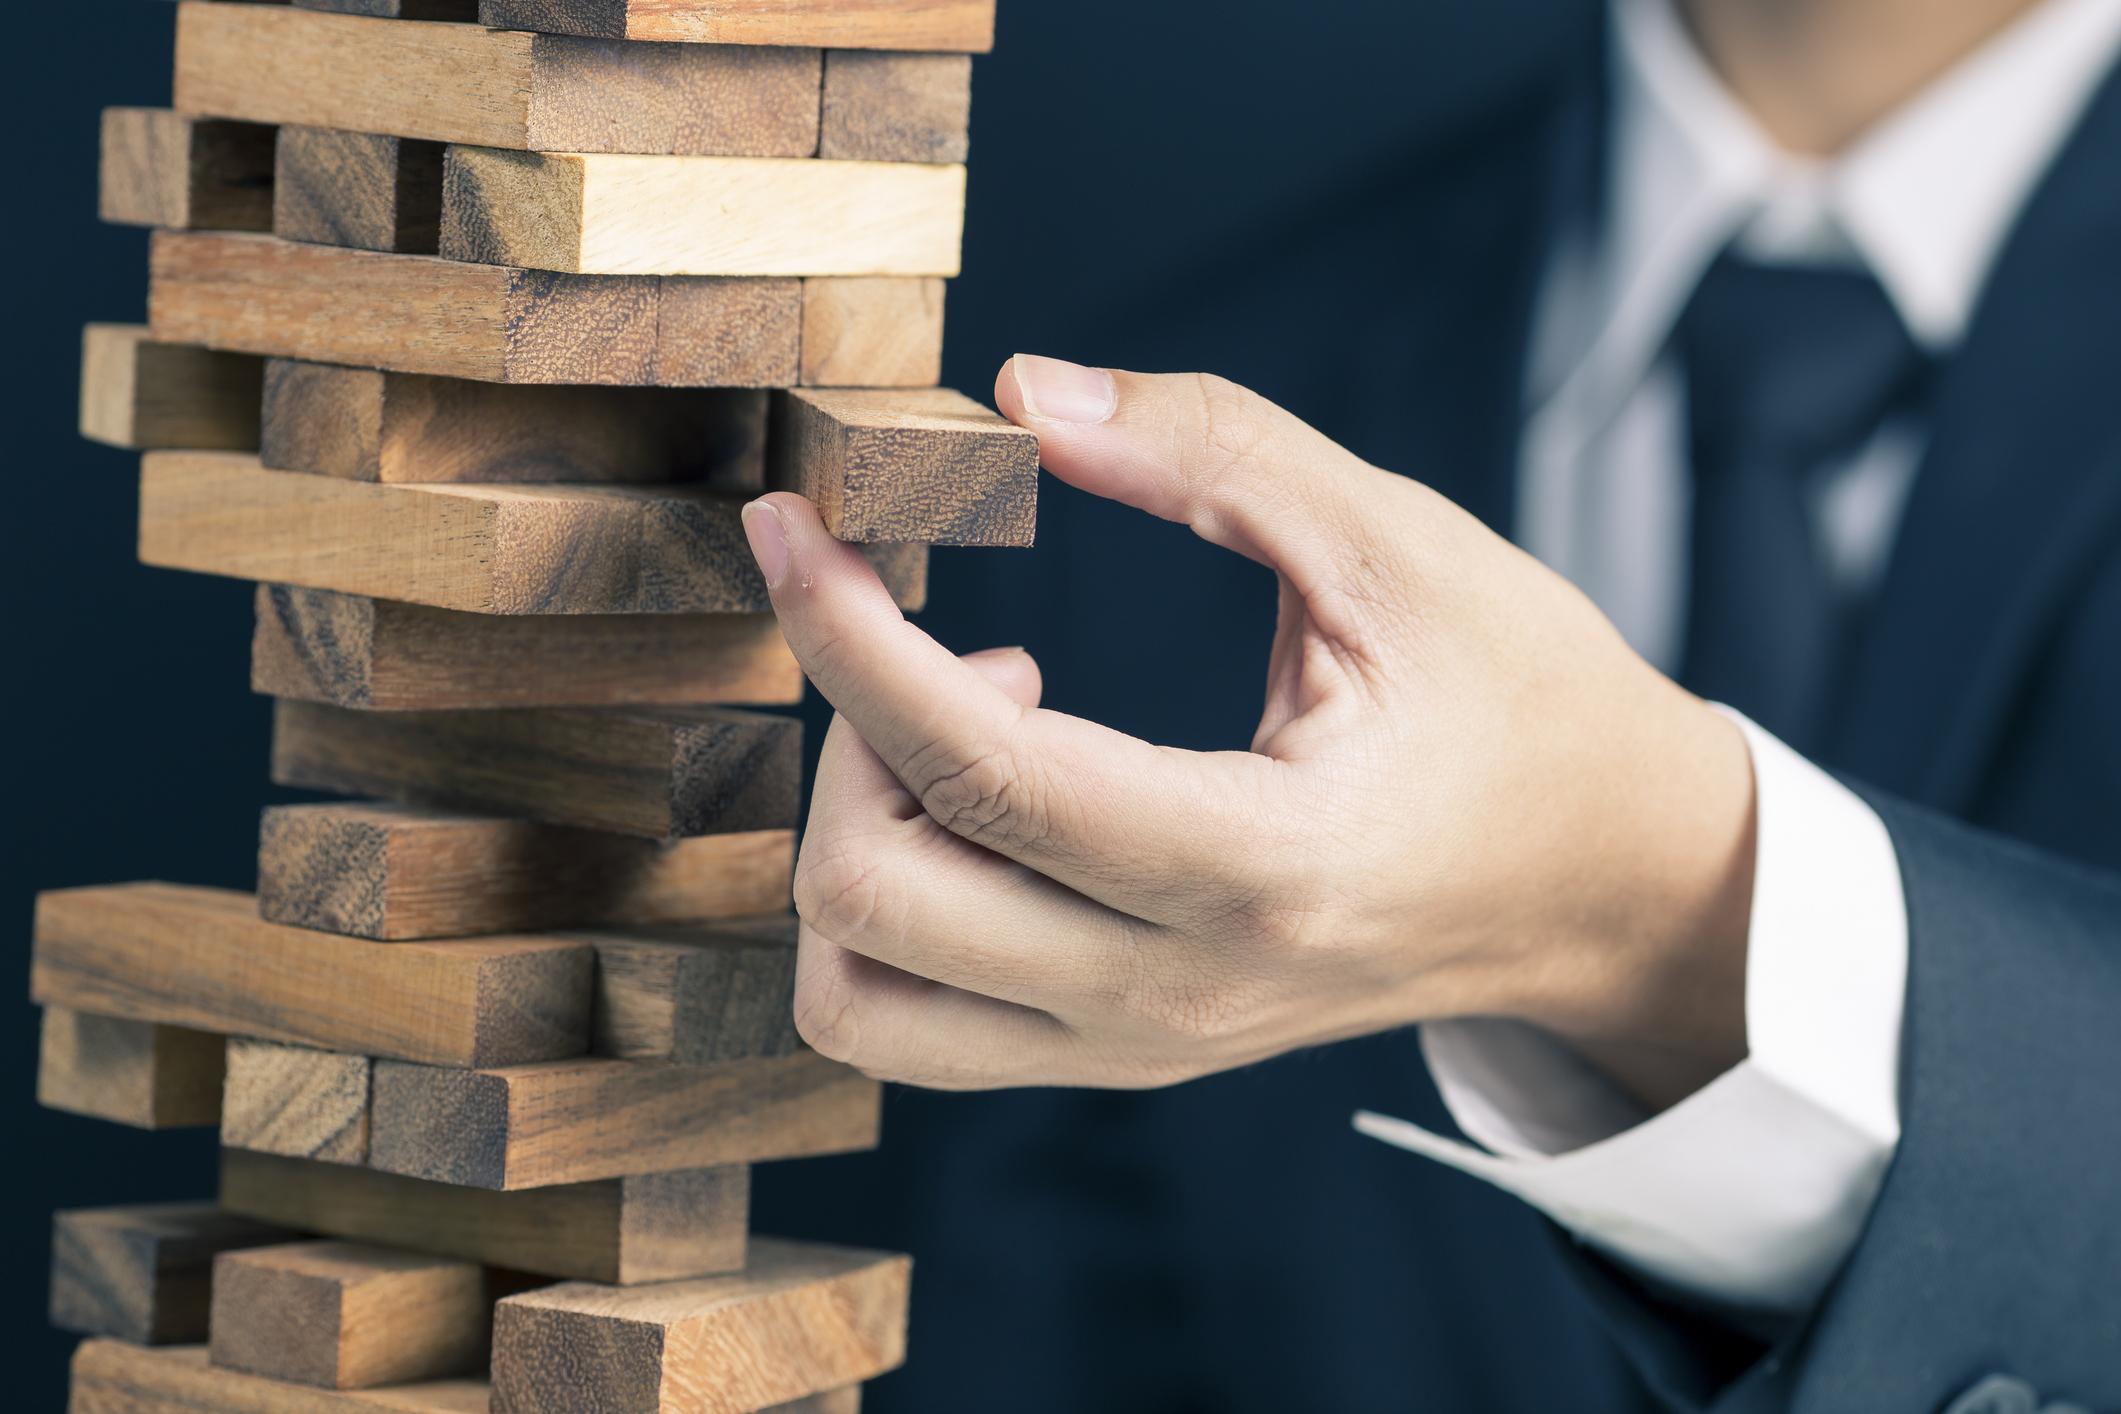 Man's hand pulling brick out of Jenga tower